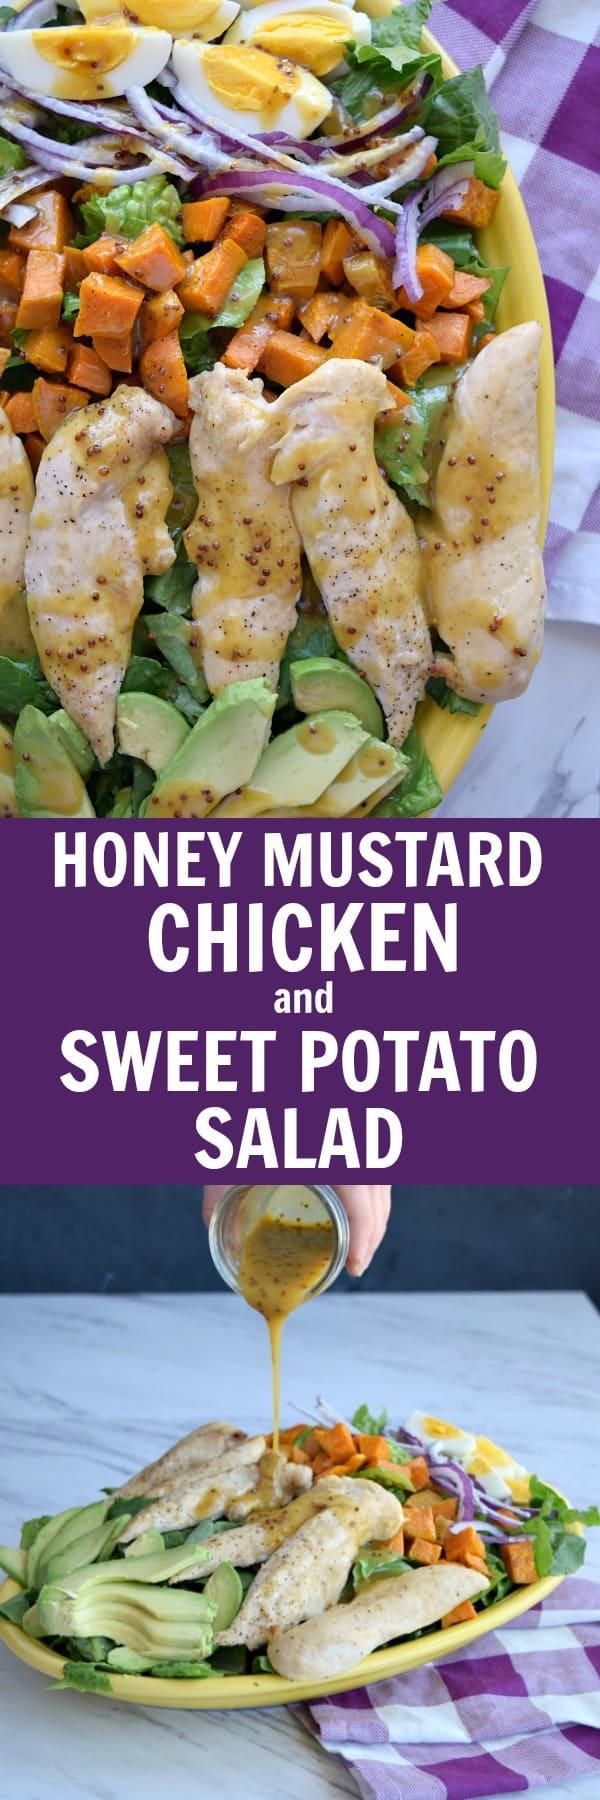 Honey Mustard Chicken and Sweet Potato Salad